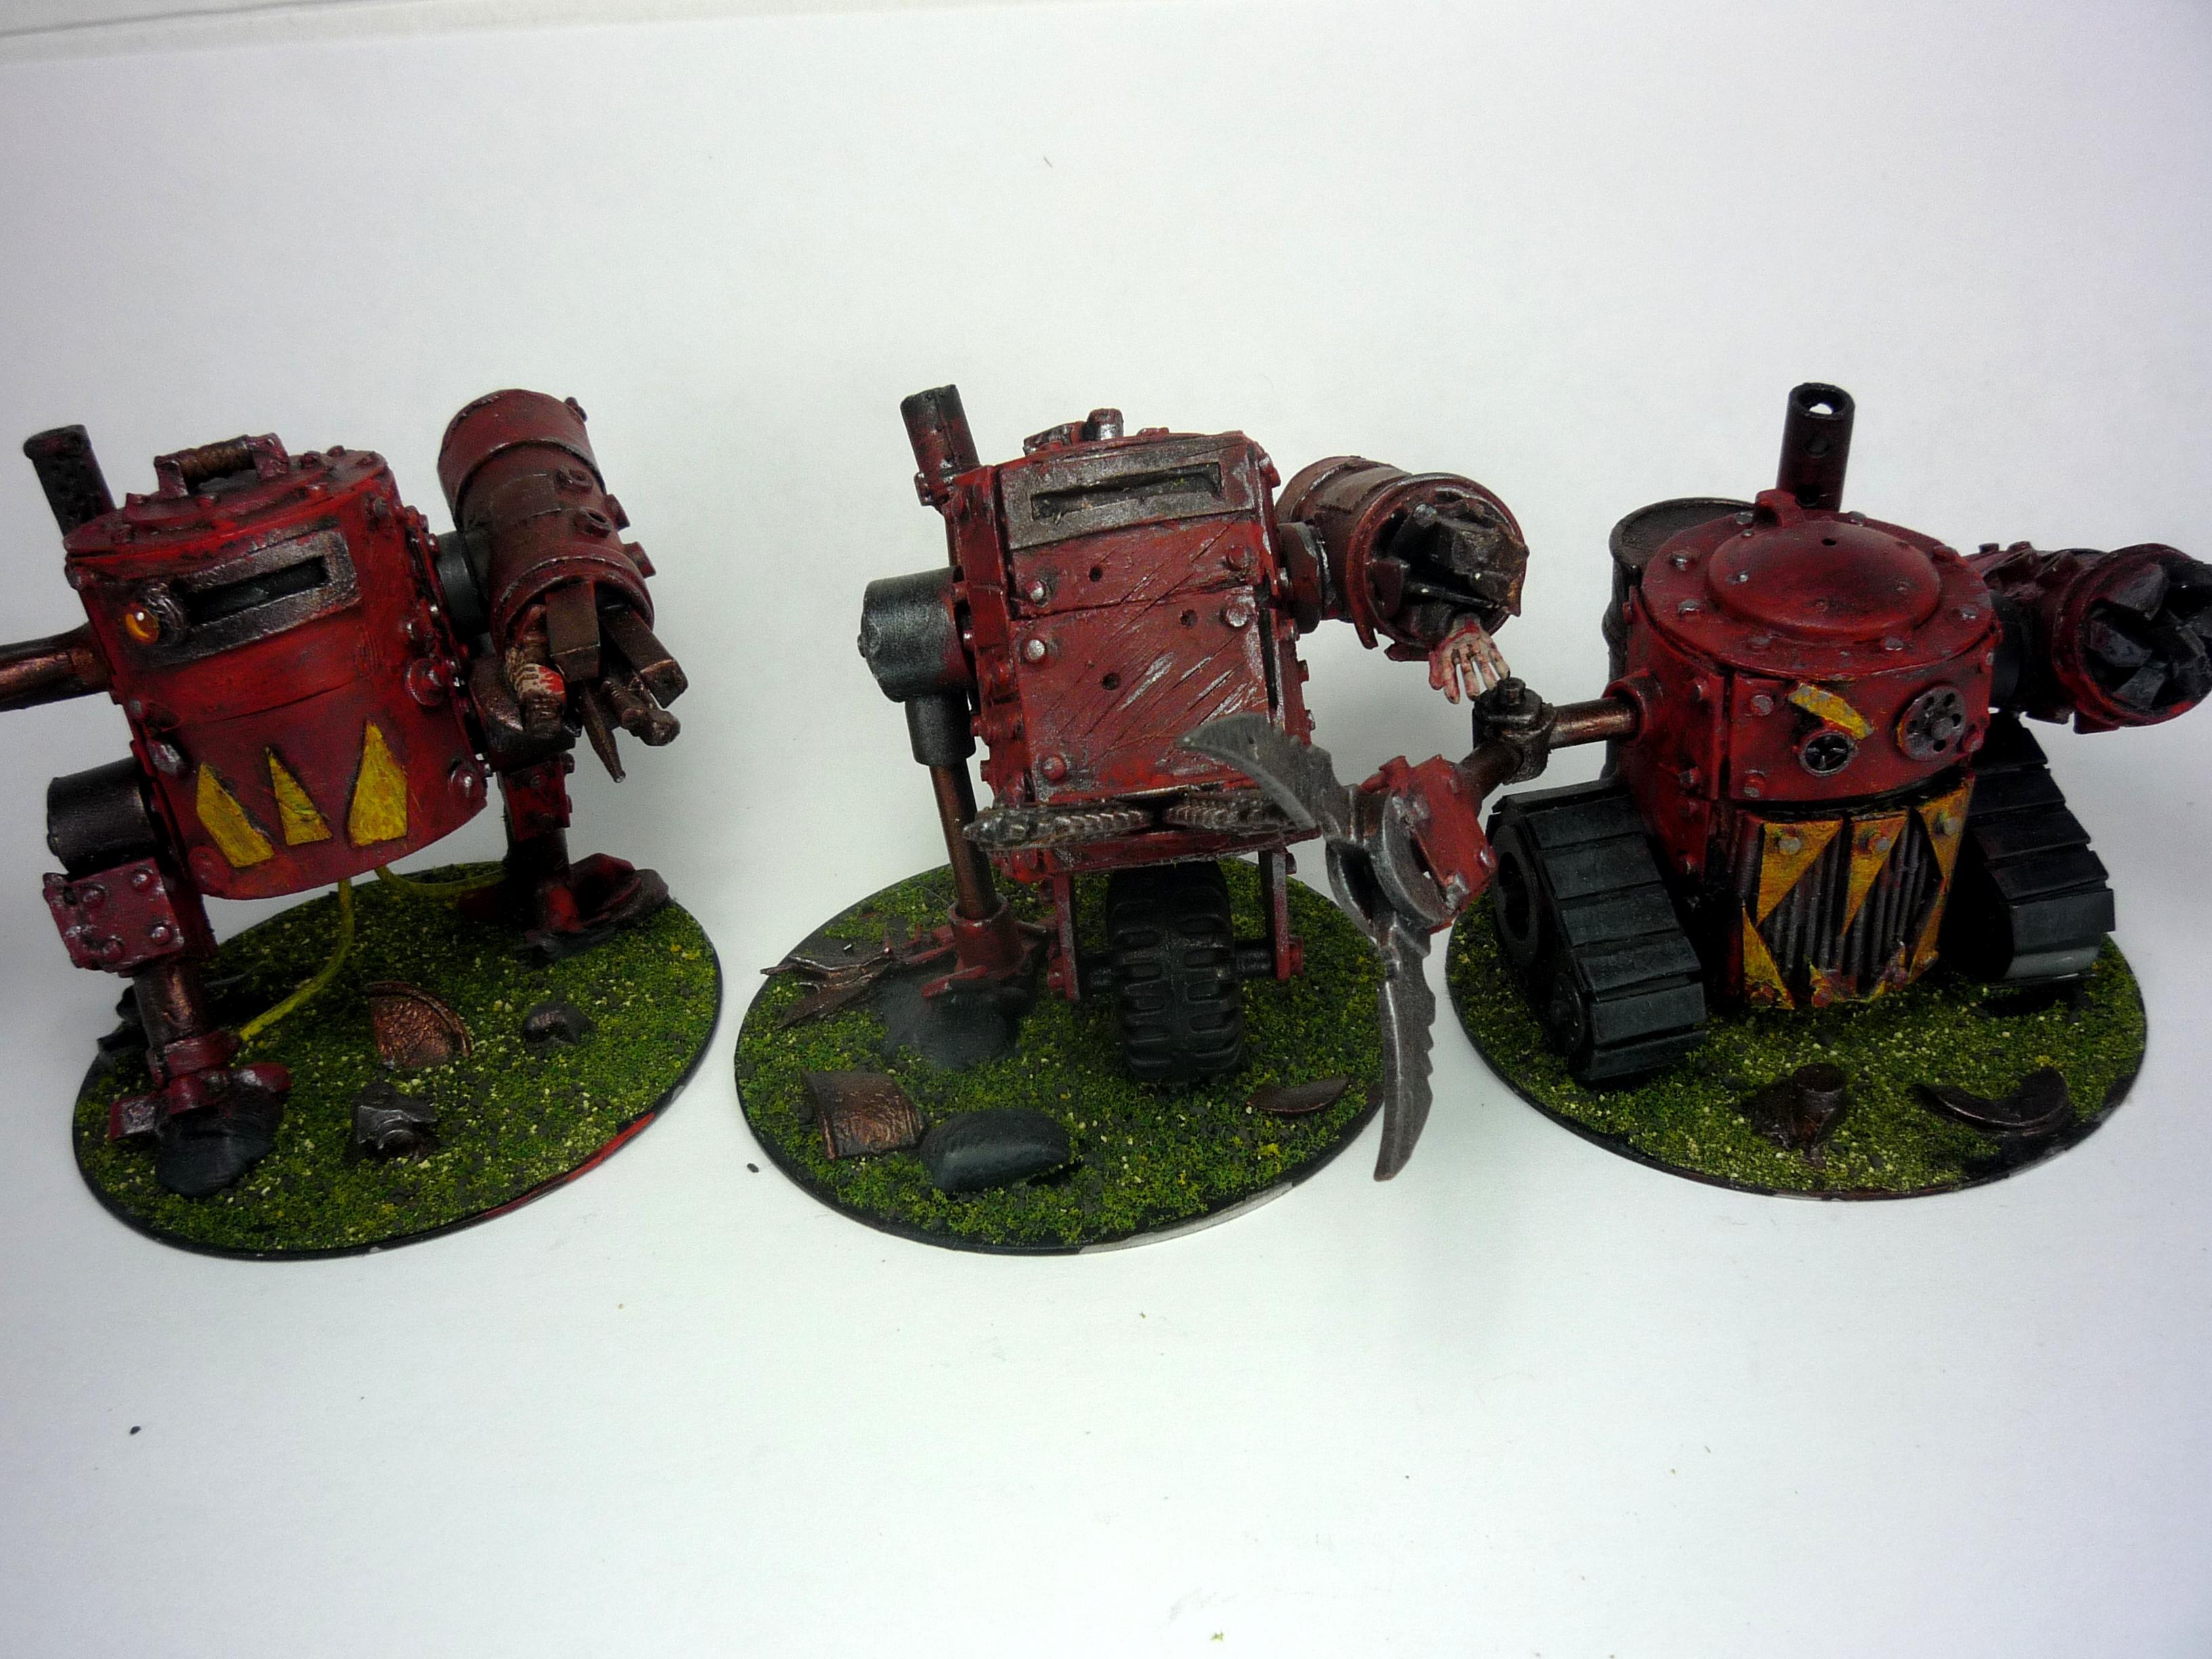 Dreadnought, Grotzooka, Killa Kan, Orks